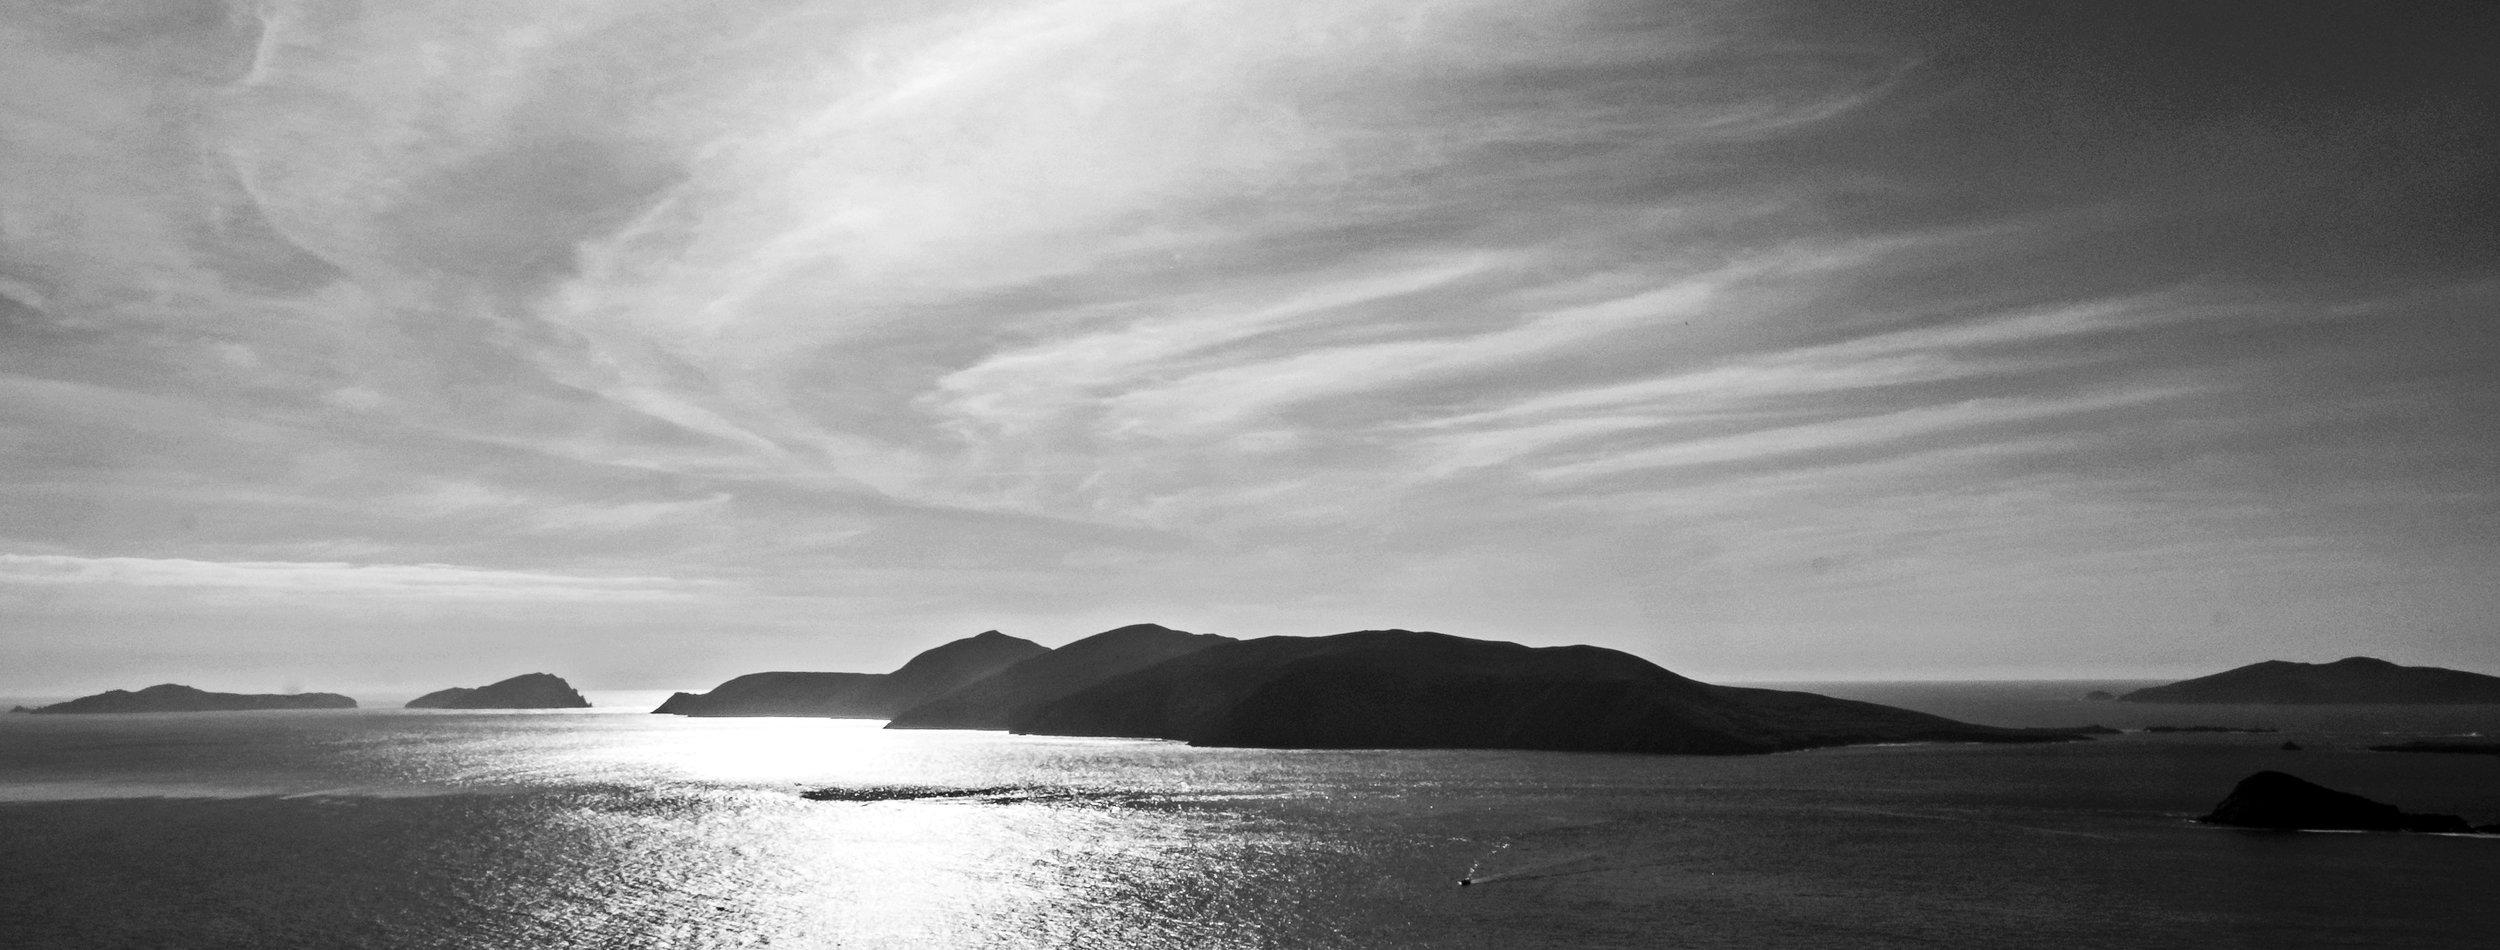 Great Blasket Island from Dunquin.jpg